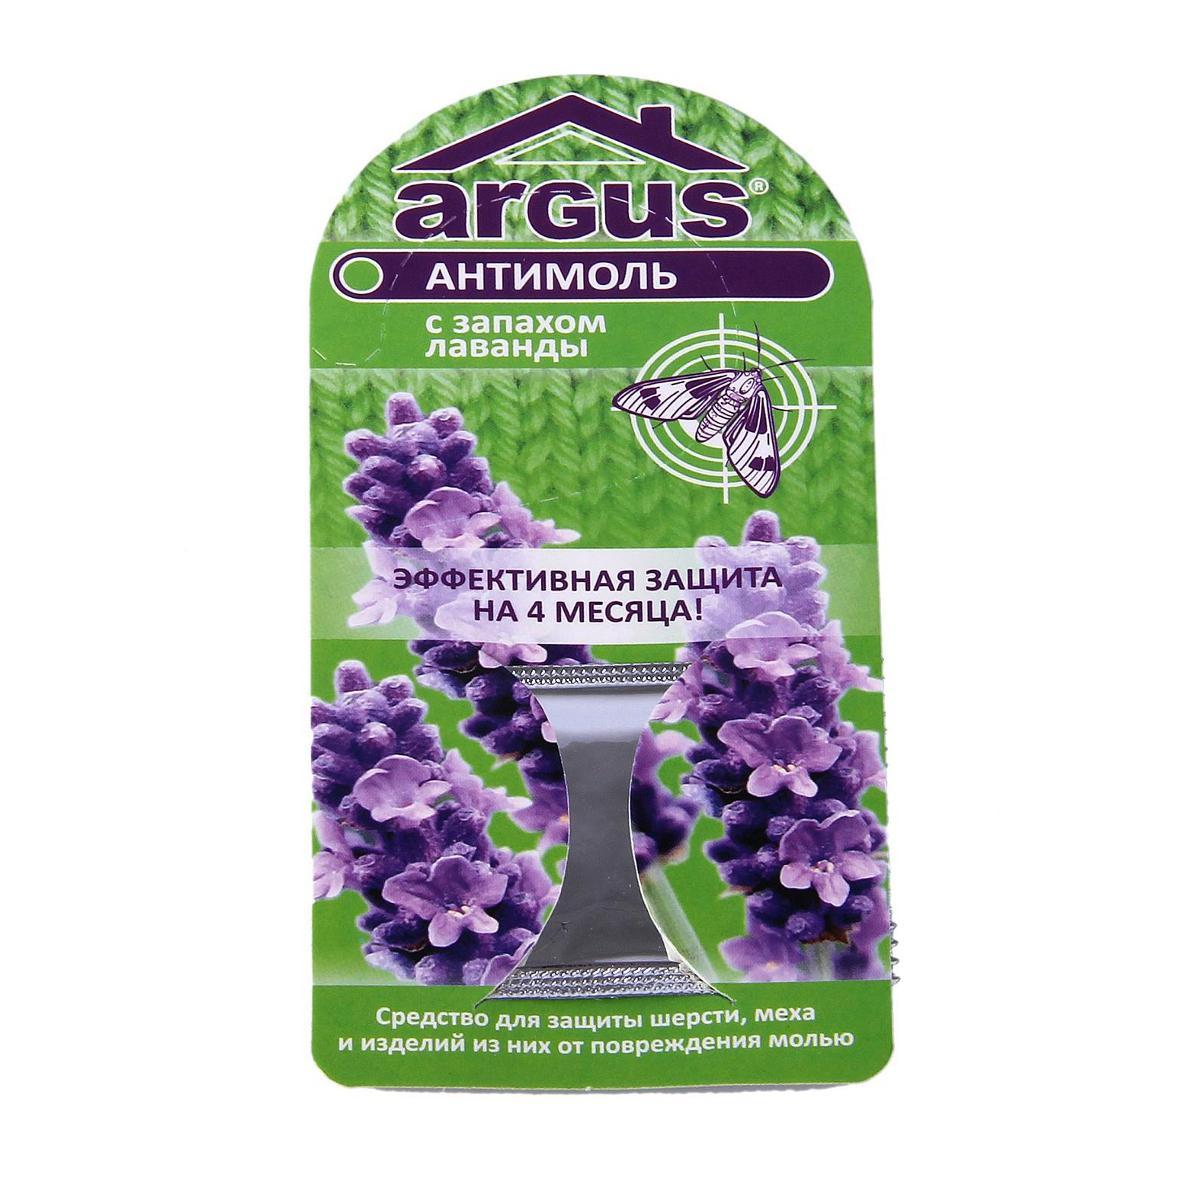 Крючок Argus СЗ.020015 торасемид сз 5мг 30 таблетки